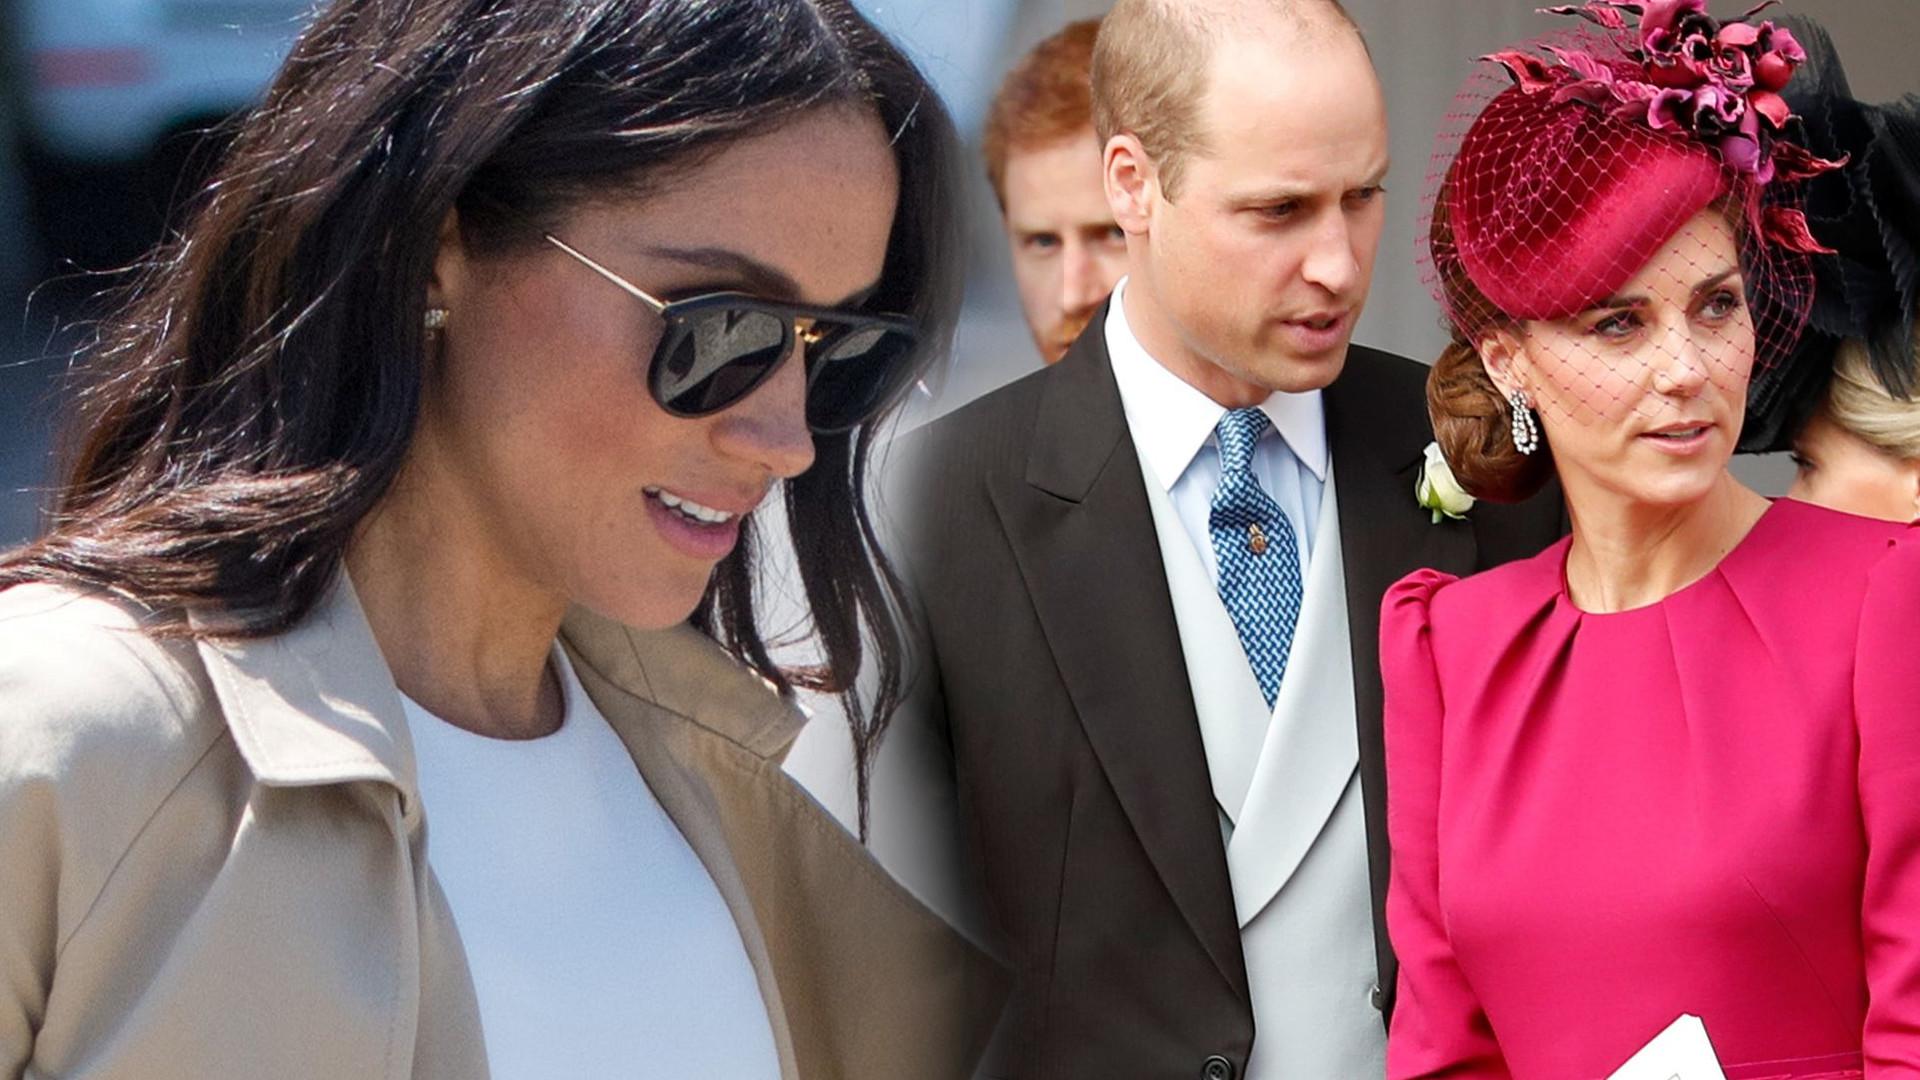 Księżna Meghan książę William księżna Kate